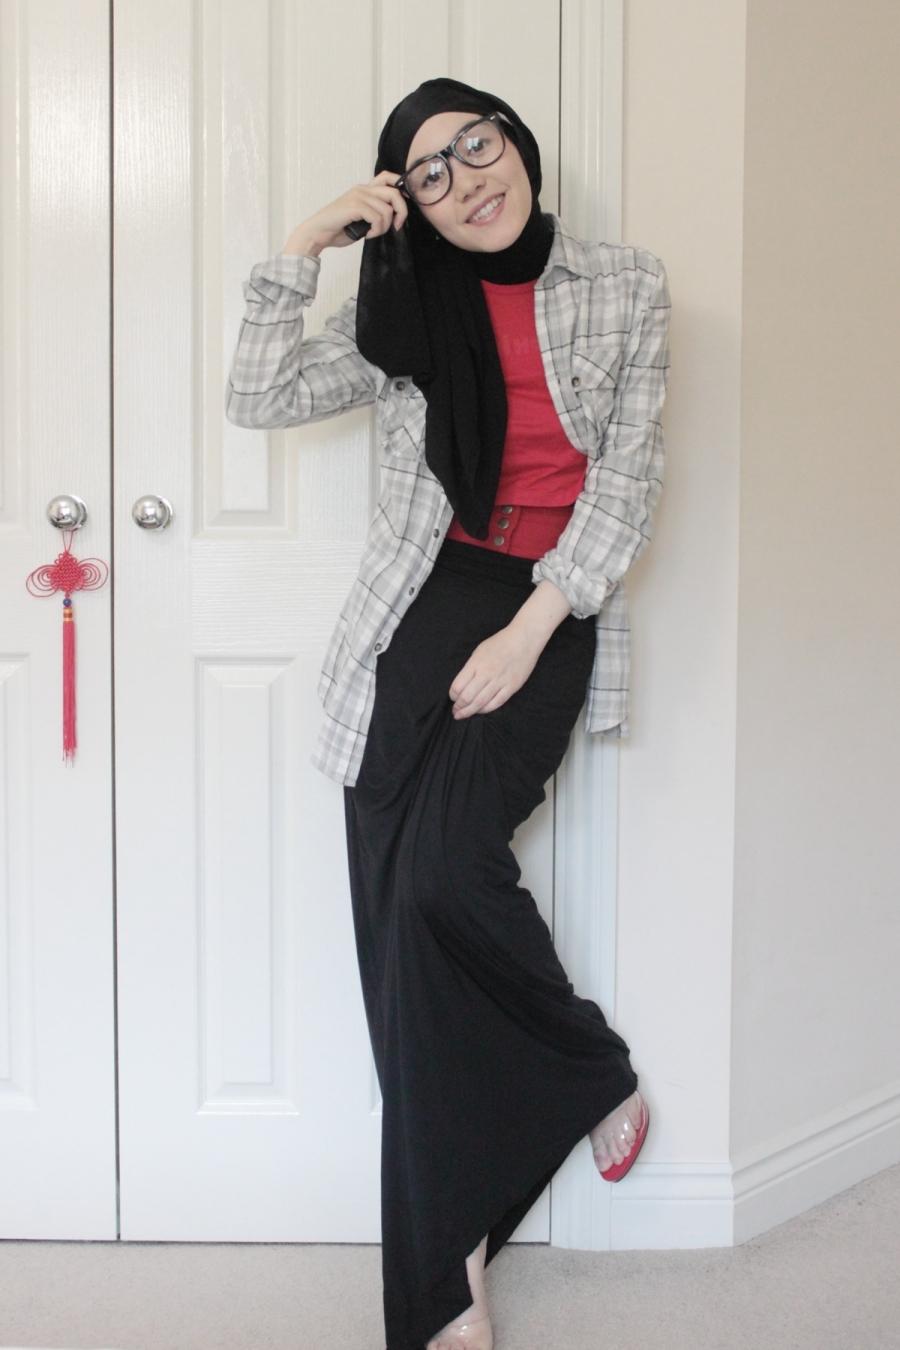 Naning sugita my fashion icon hana tajima simpson Hijab fashion style hana tajima